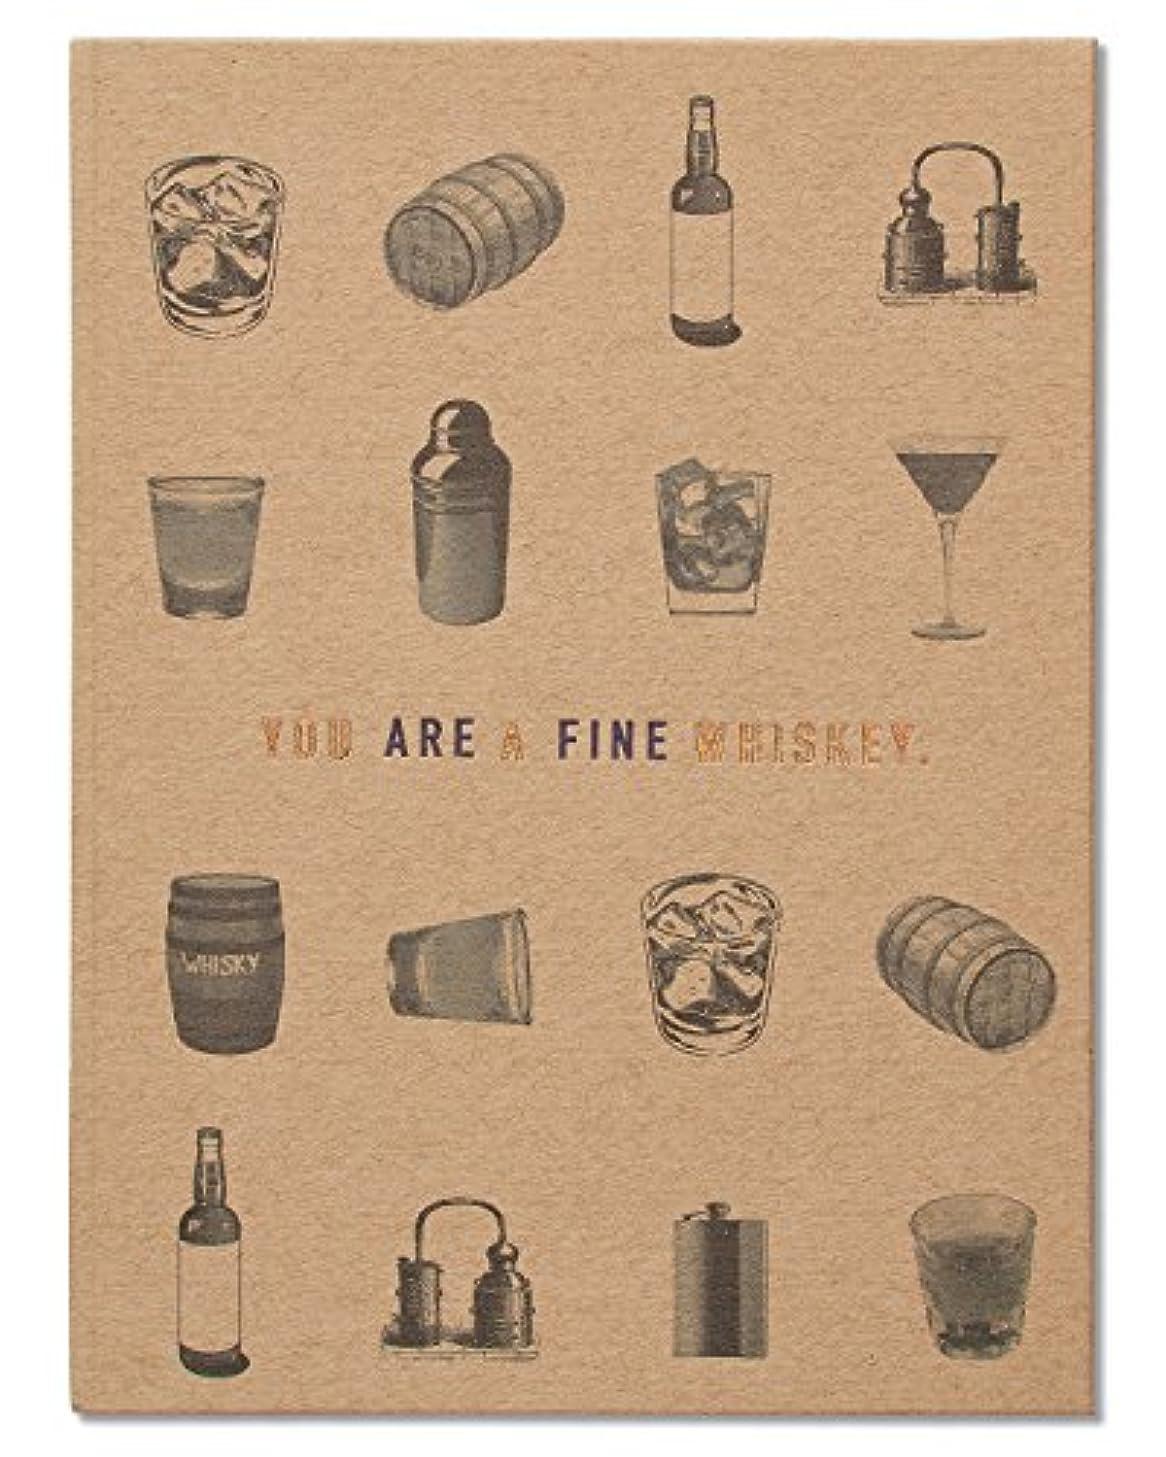 American Greetings Funny Whiskey Birthday Card - 5856721